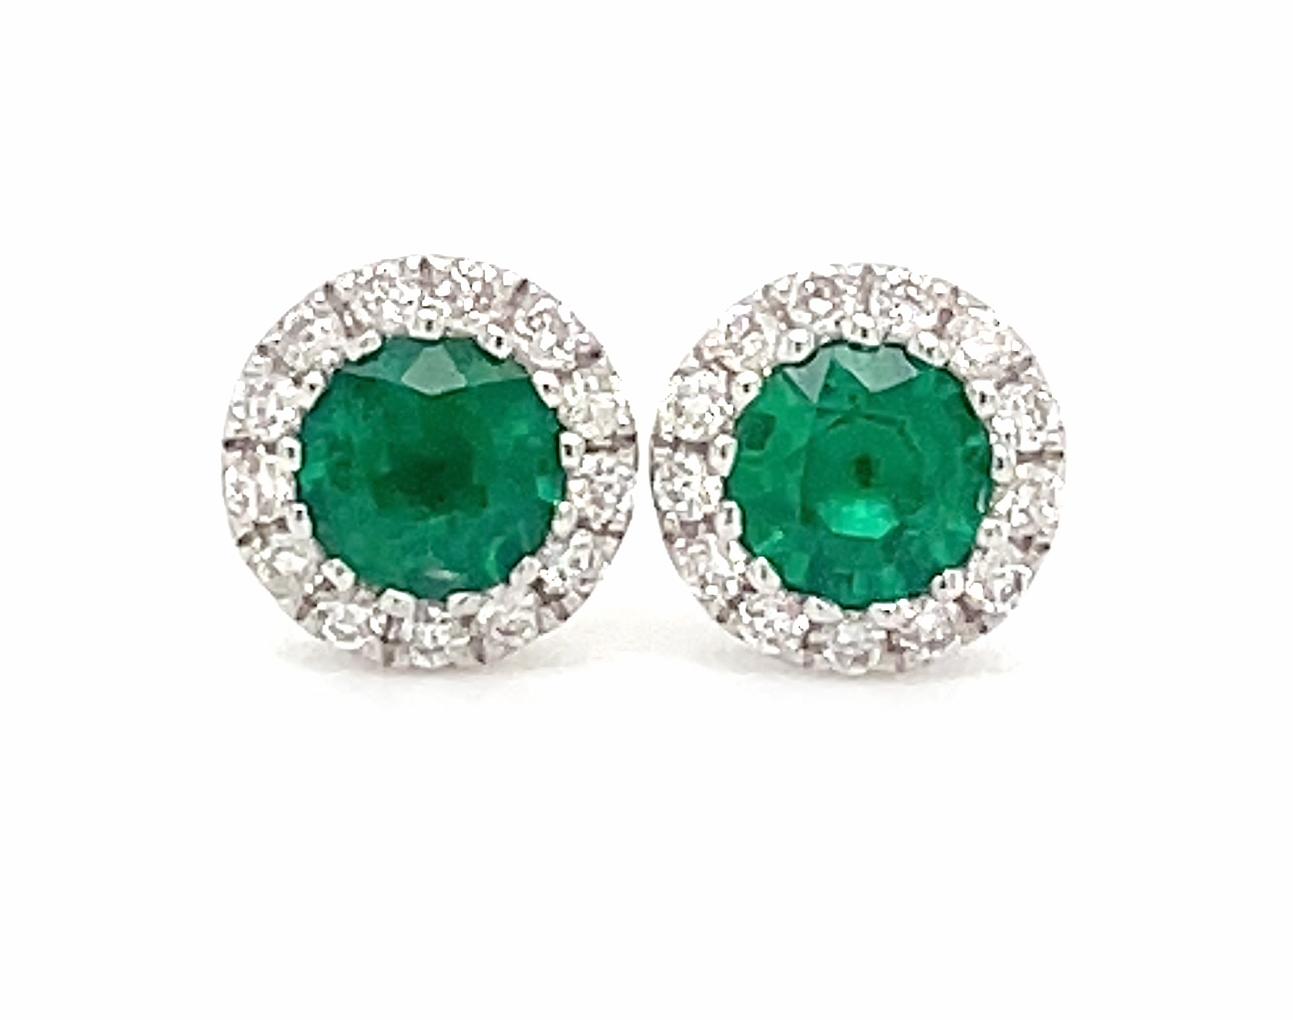 18k White Gold Round Emerald & Brilliant Cut Diamond Cluster Stud Earrings